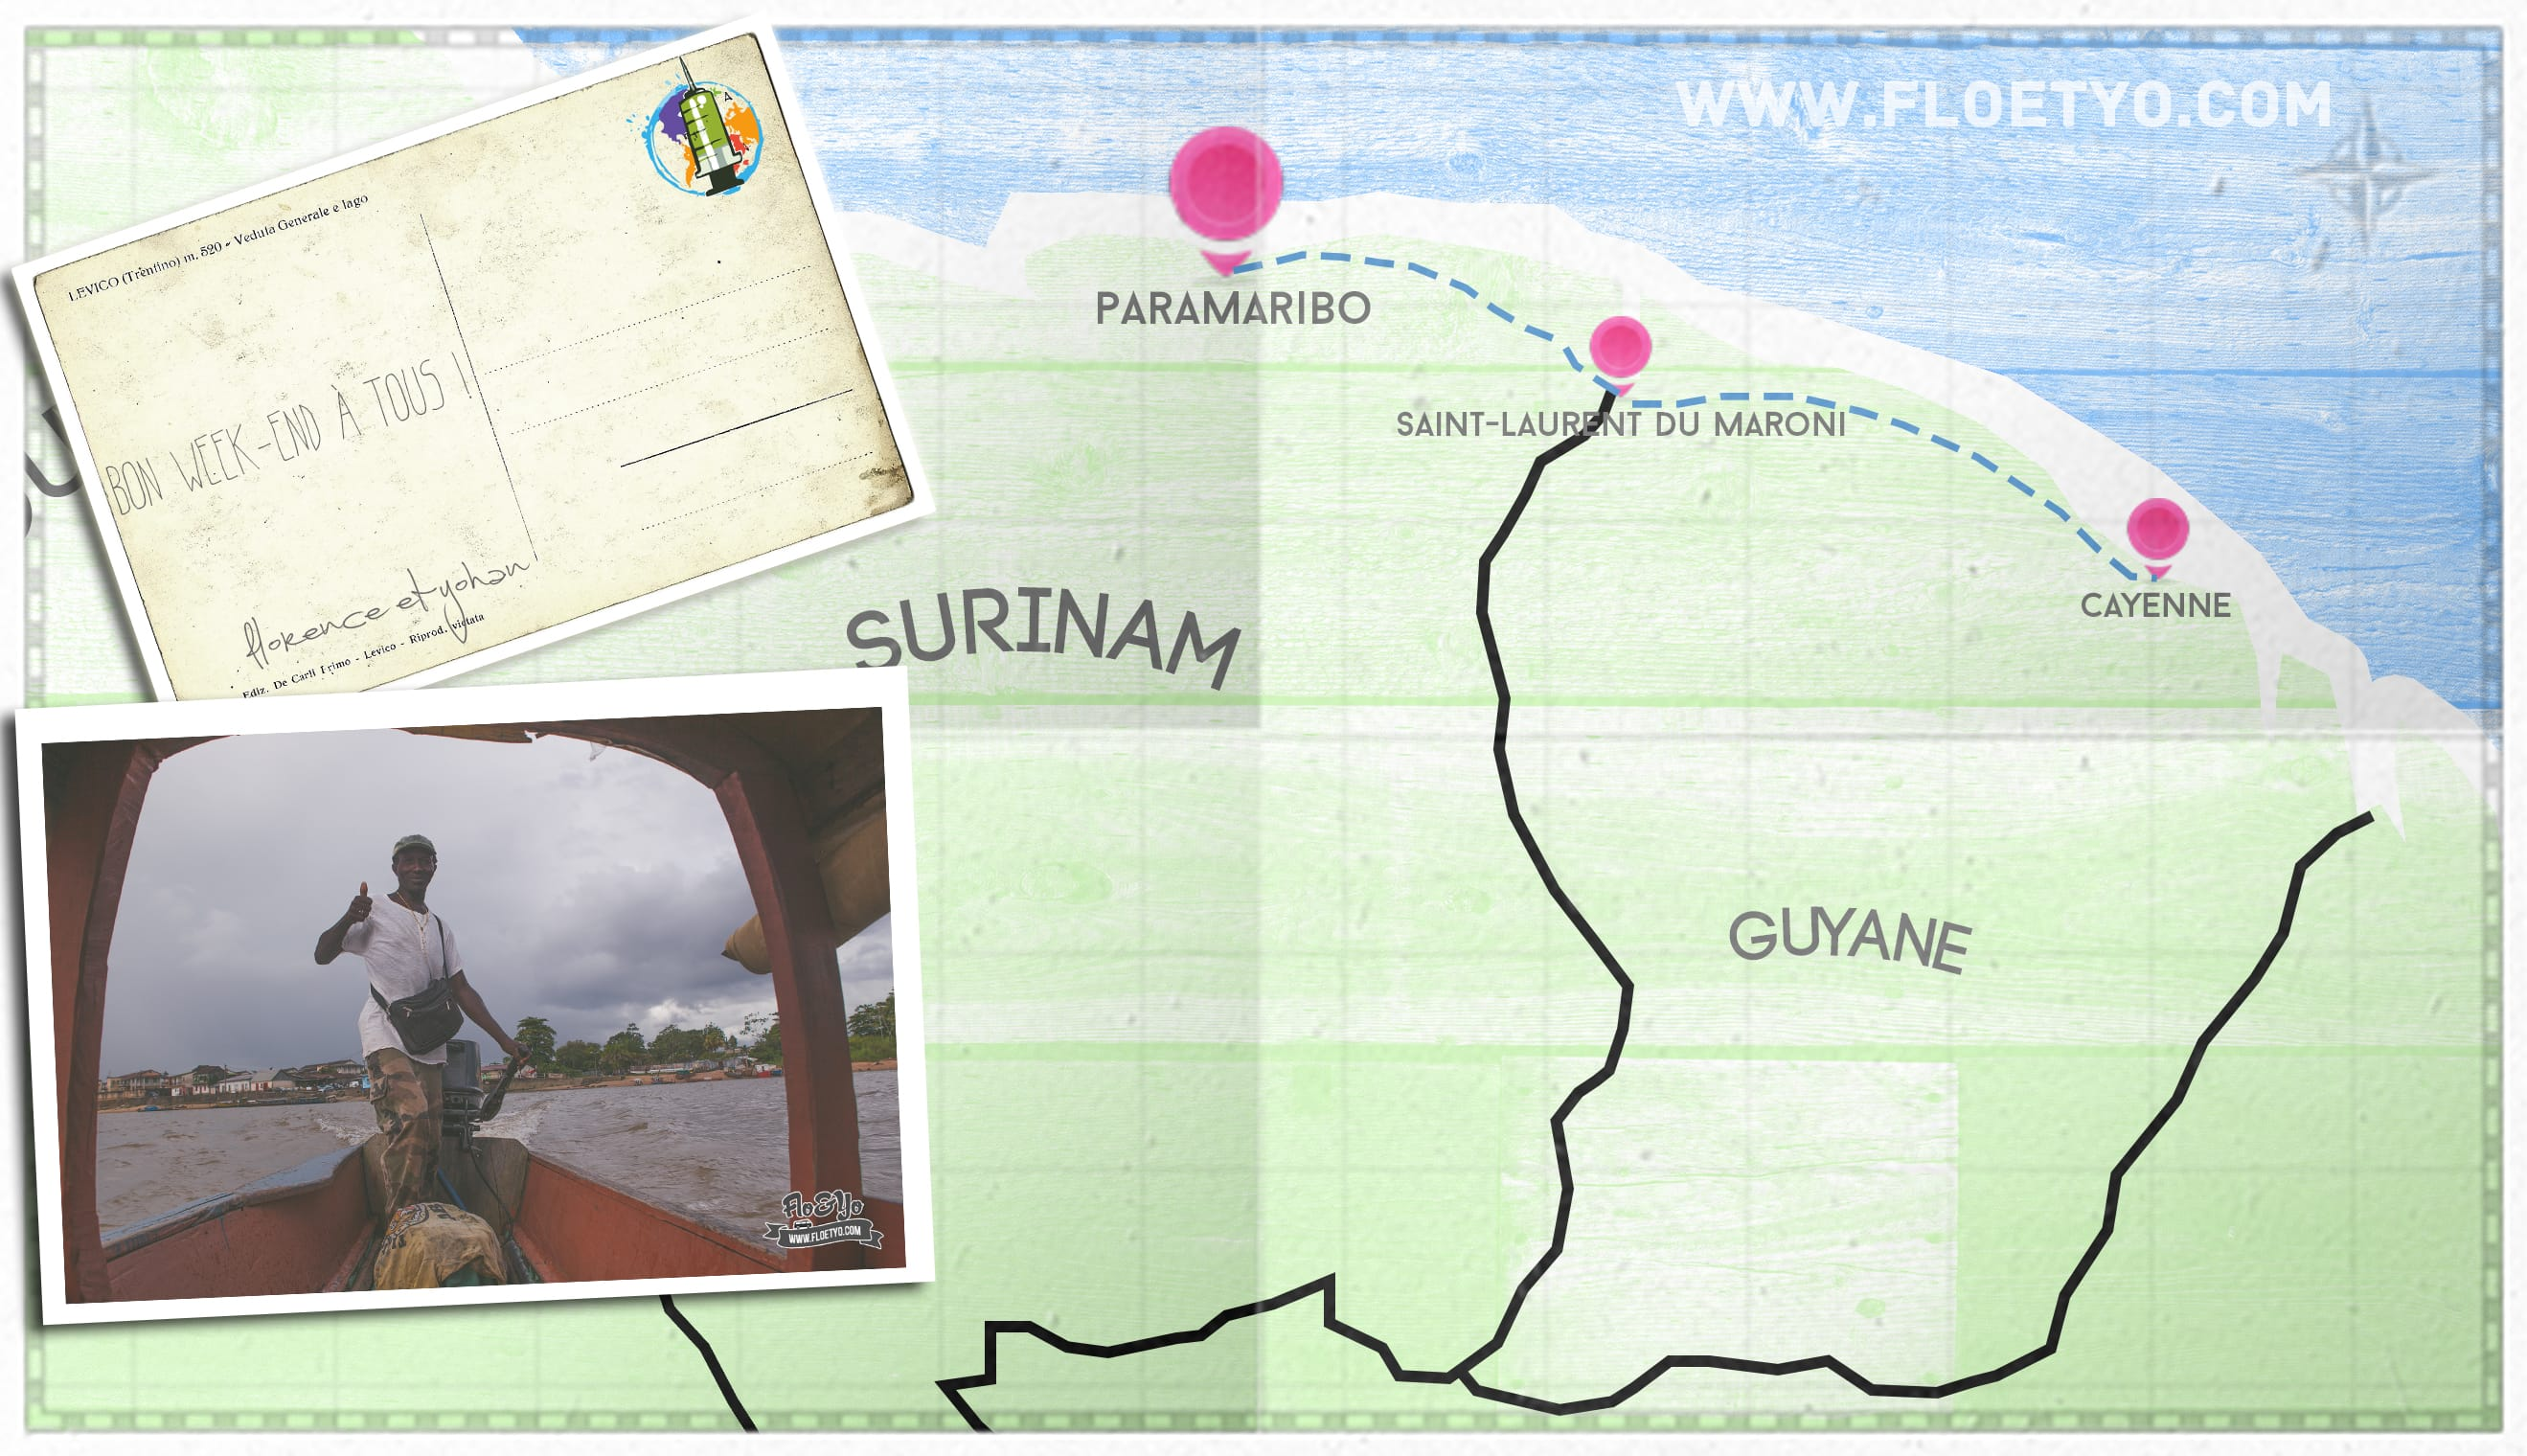 Passer un week-end à Paramaribo au Suriname !